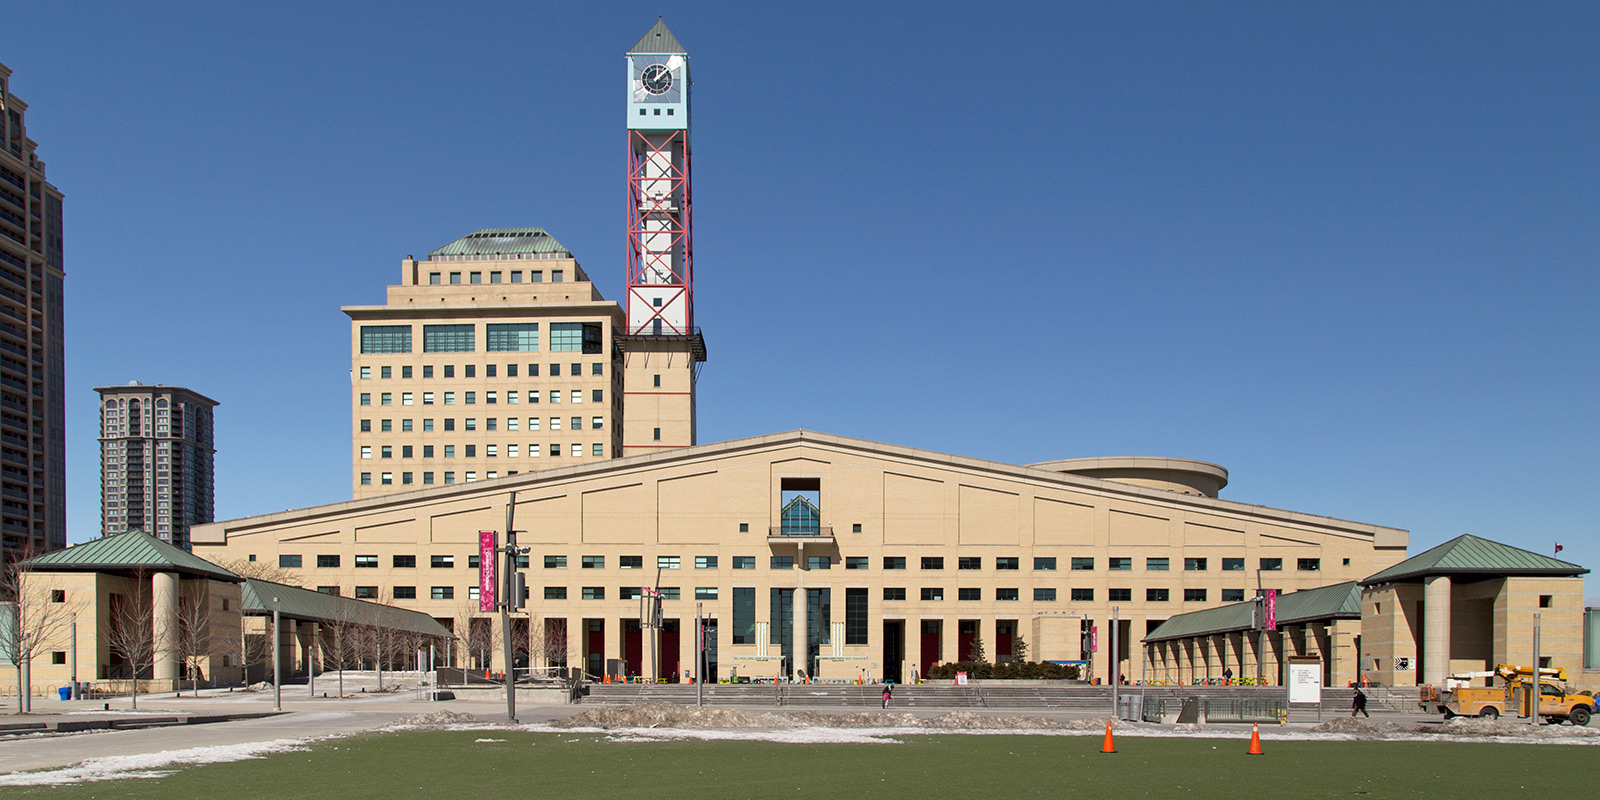 20140326 Mississauga Civic Centre Postmodern Architects Jones And Kirkland